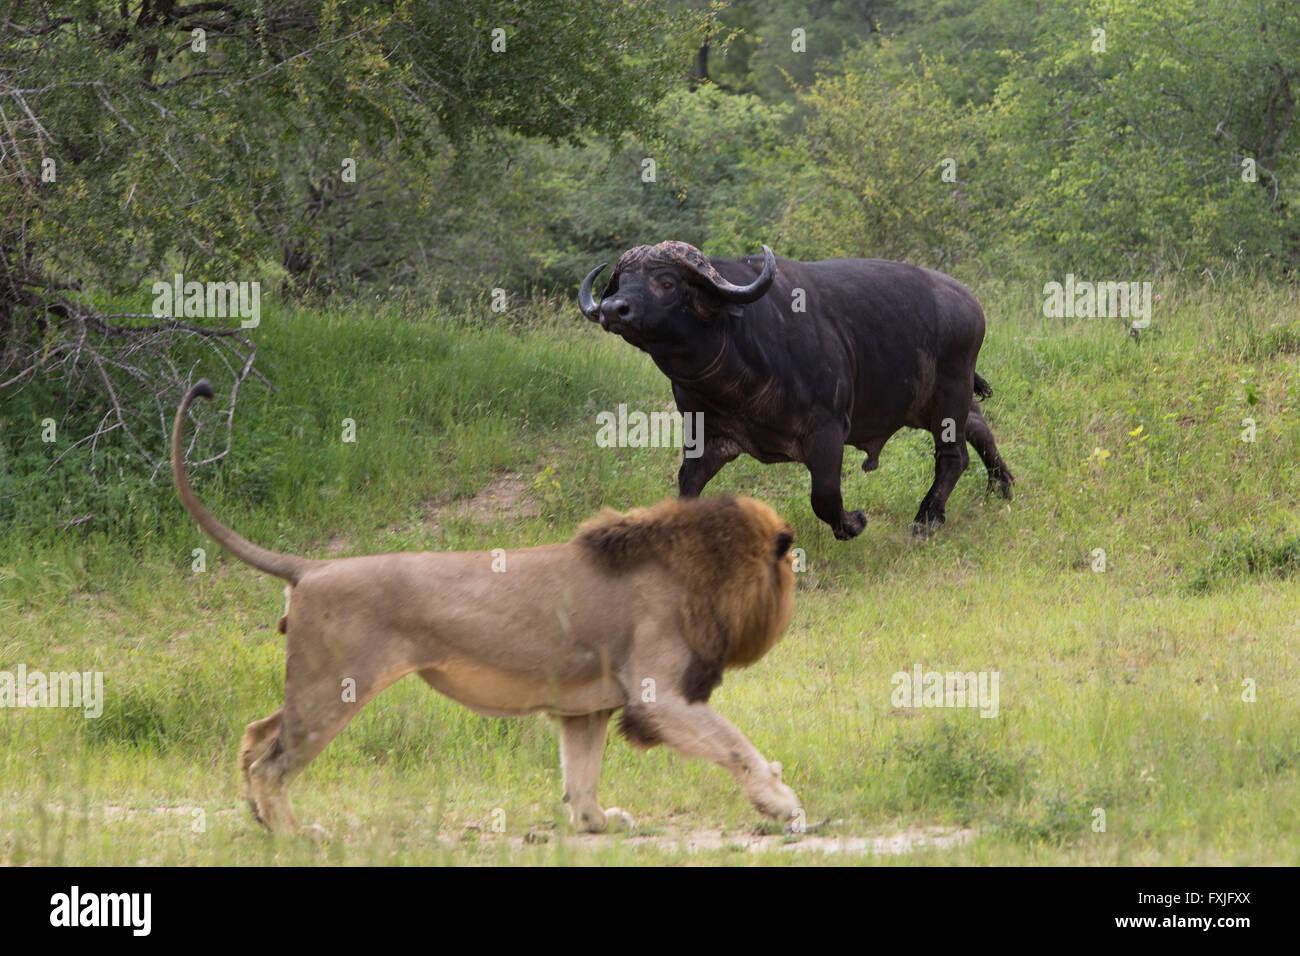 Lion Hunting Buffalo Stock Photos & Lion Hunting Buffalo